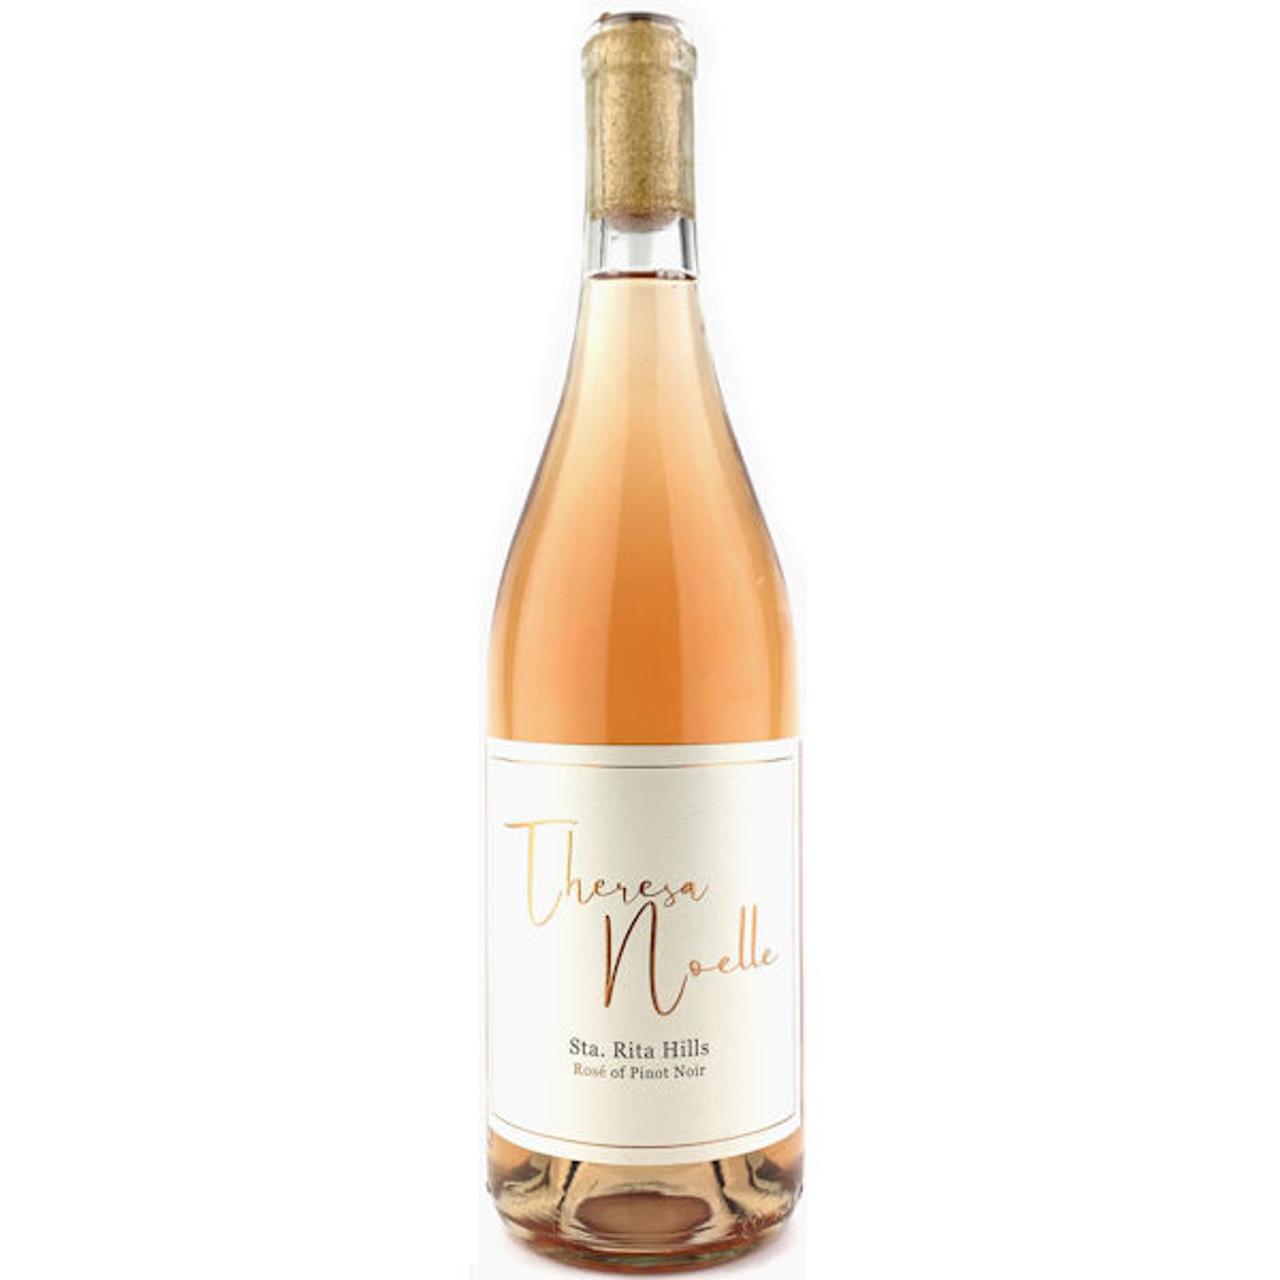 Theresa Noelle Sta. Rita Hills Rose of Pinot Noir